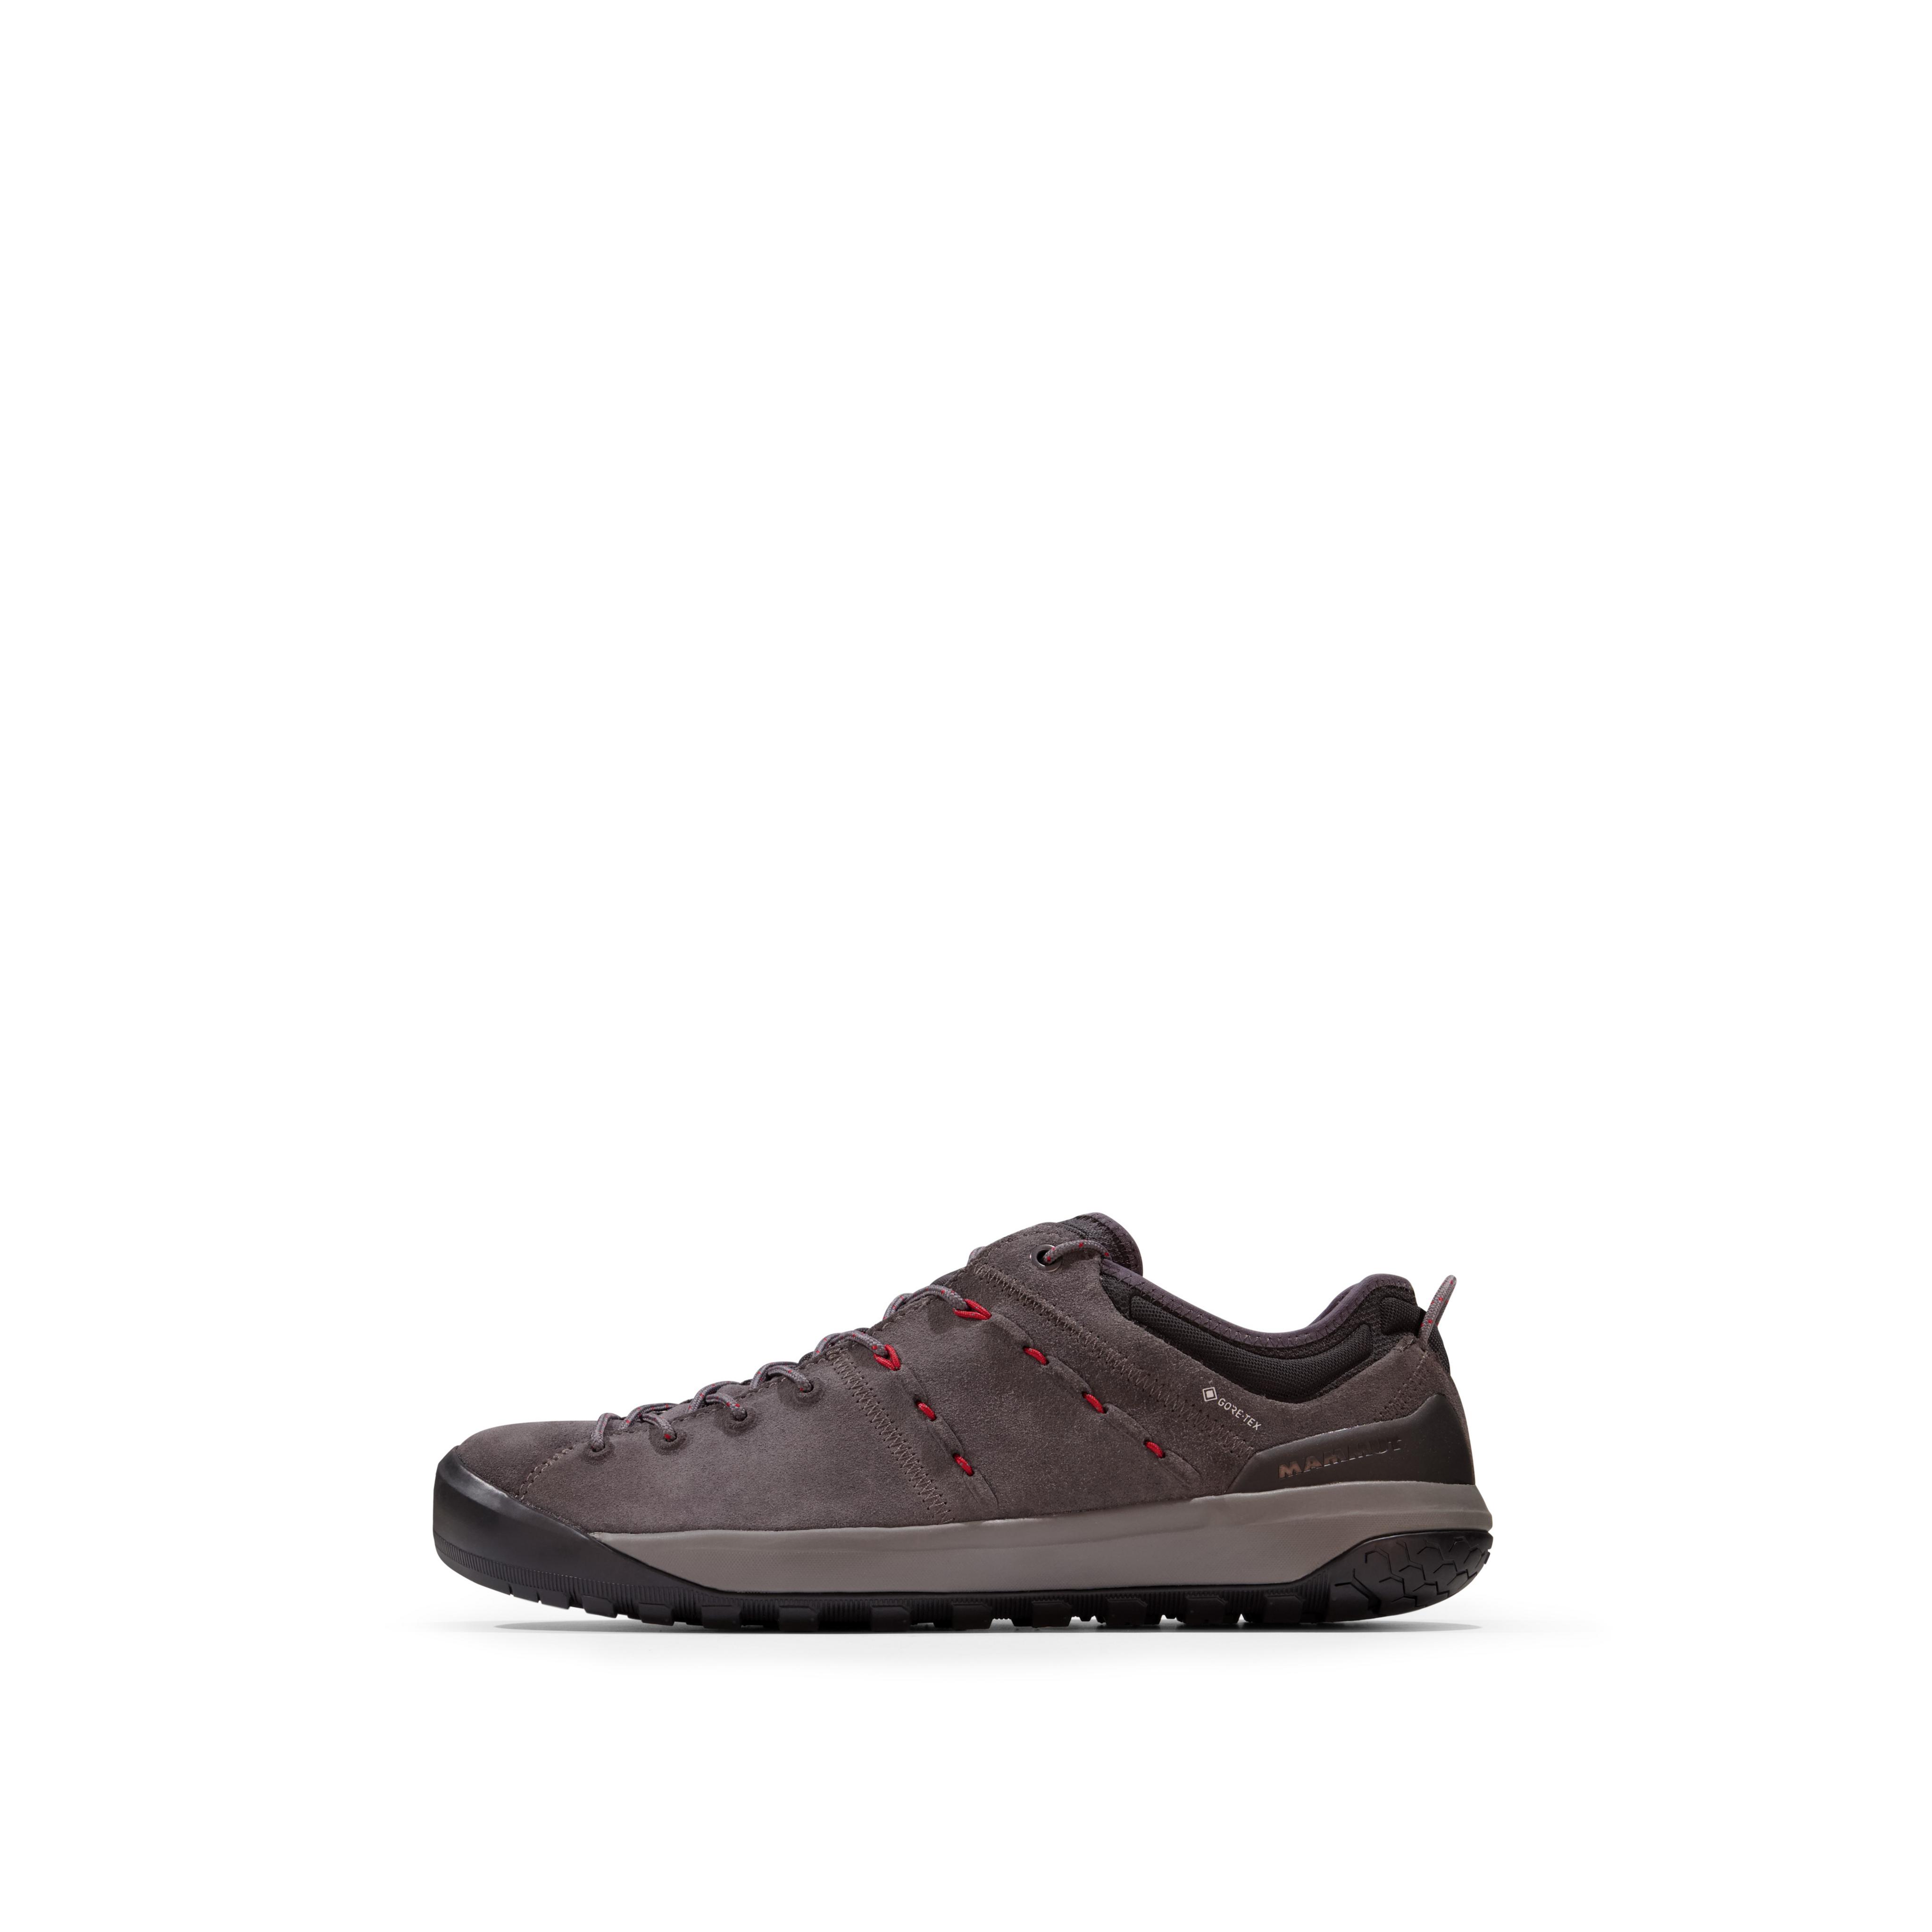 Hueco Low GTX® Men - graphite-magma, UK 6.5 thumbnail